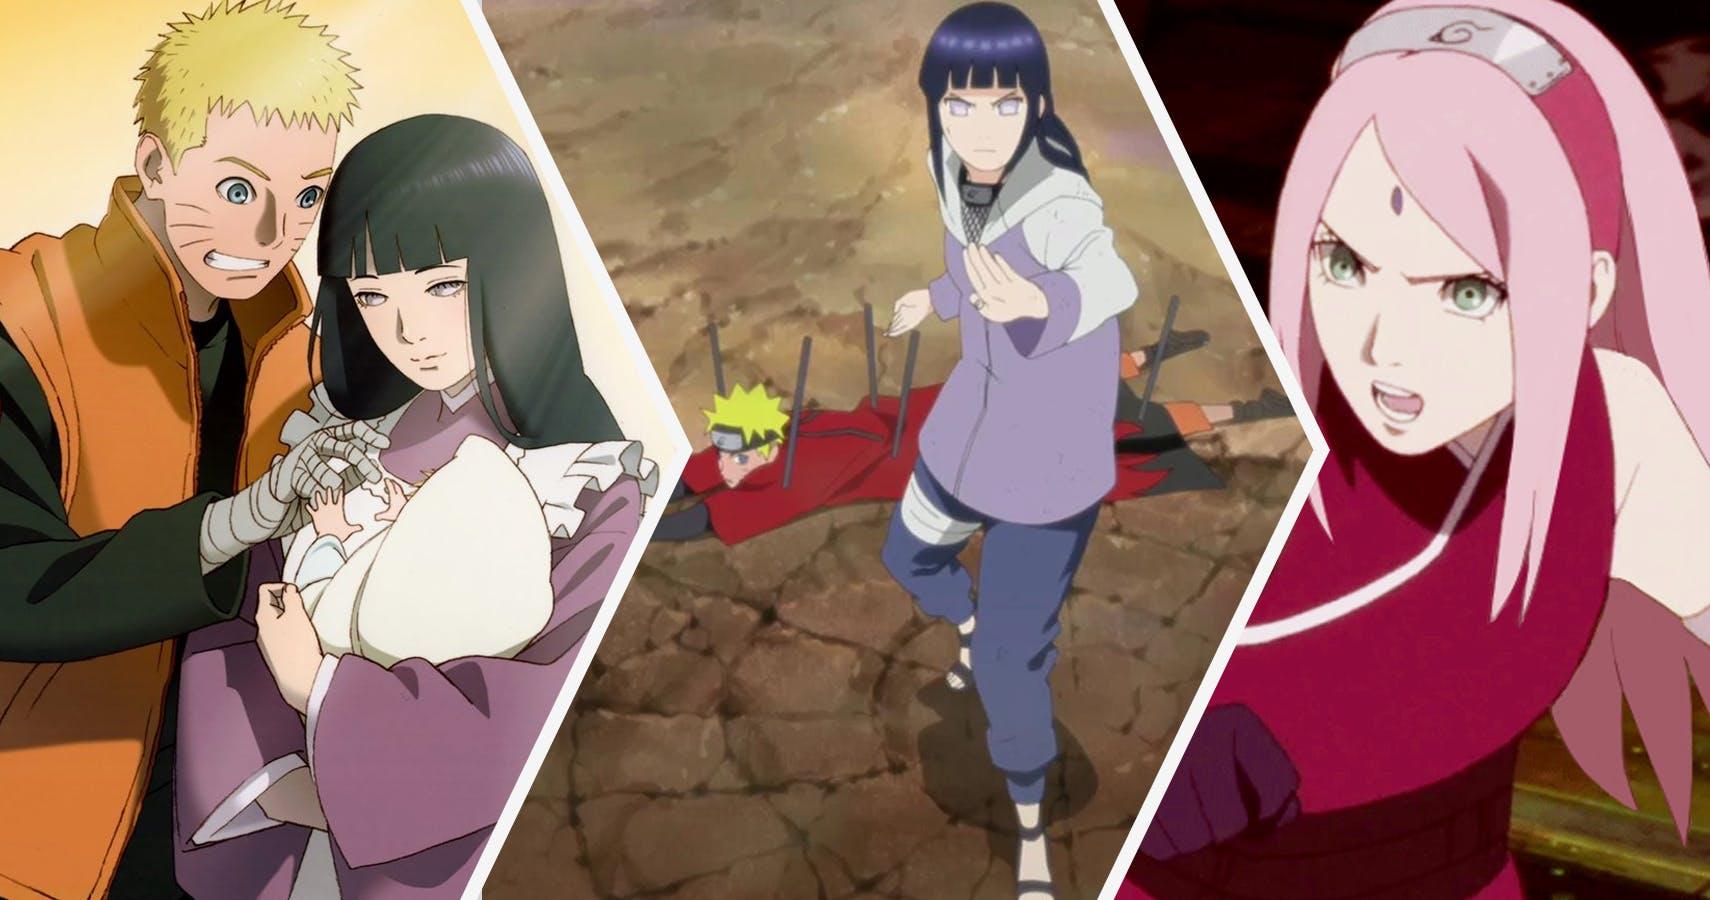 Wallpaper Girl Boy Holding Hands Masashi Kishimoto Revela Porque Porque Naruto Casou Se Com